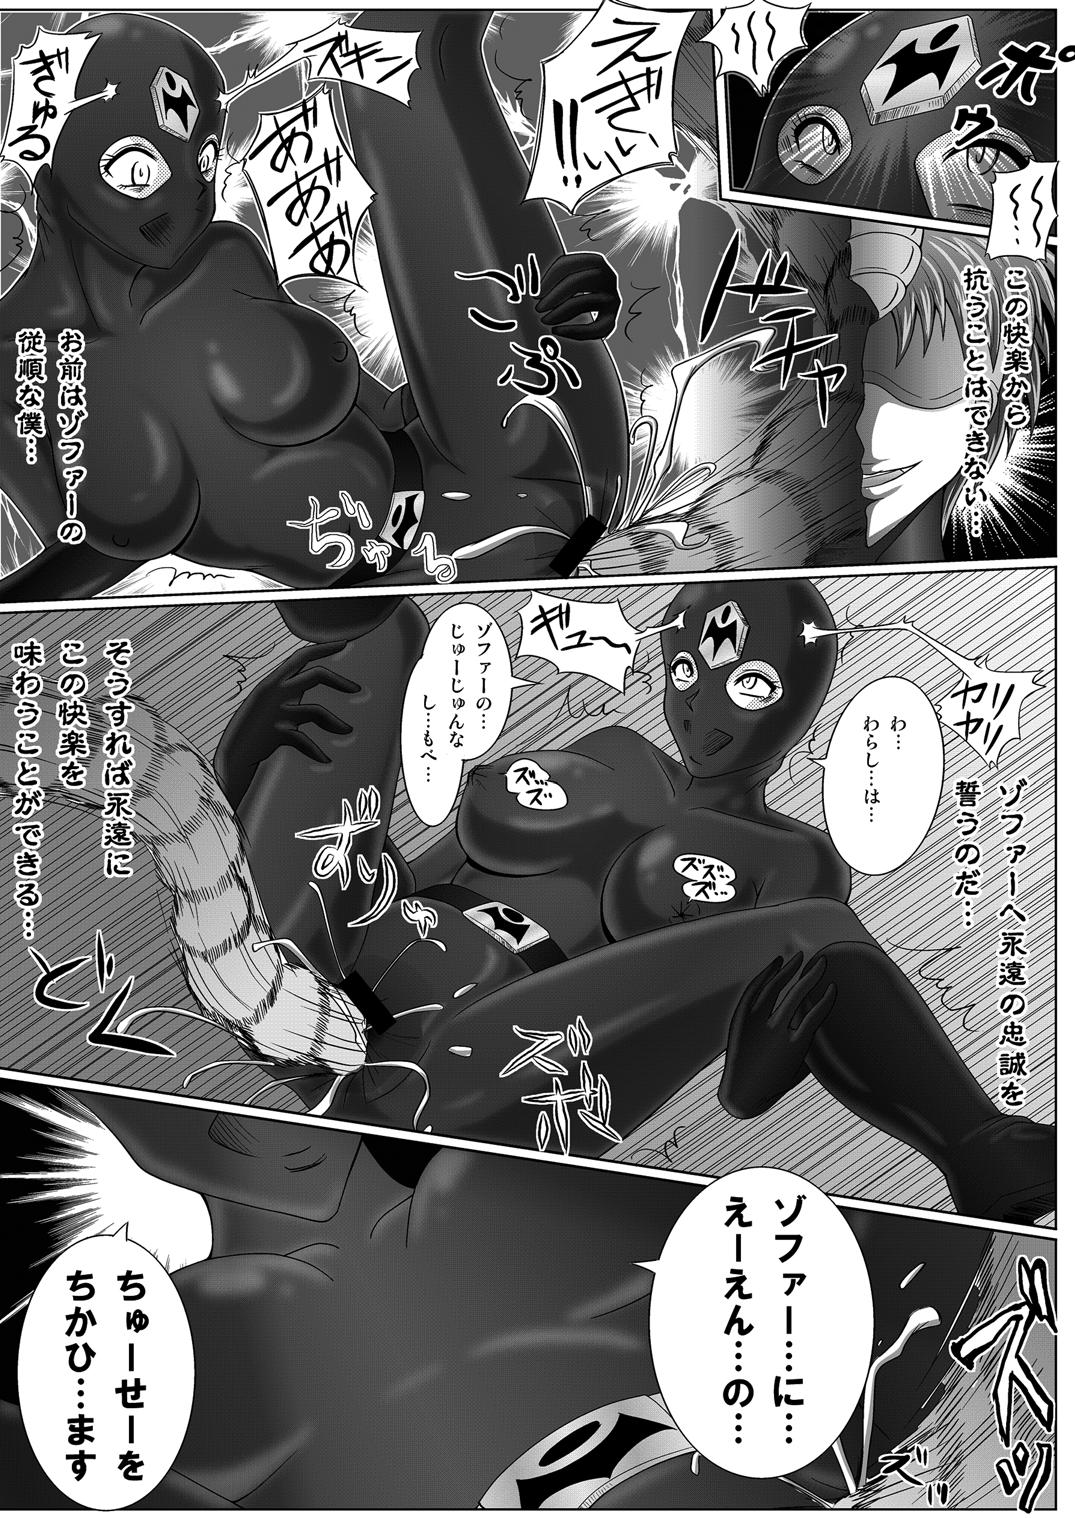 [Macxe's (monmon)] Tokubousentai Dinaranger ~Heroine Kairaku Sennou Keikaku~ Vol.01/02/03 (Renkaban) [Digital] 29